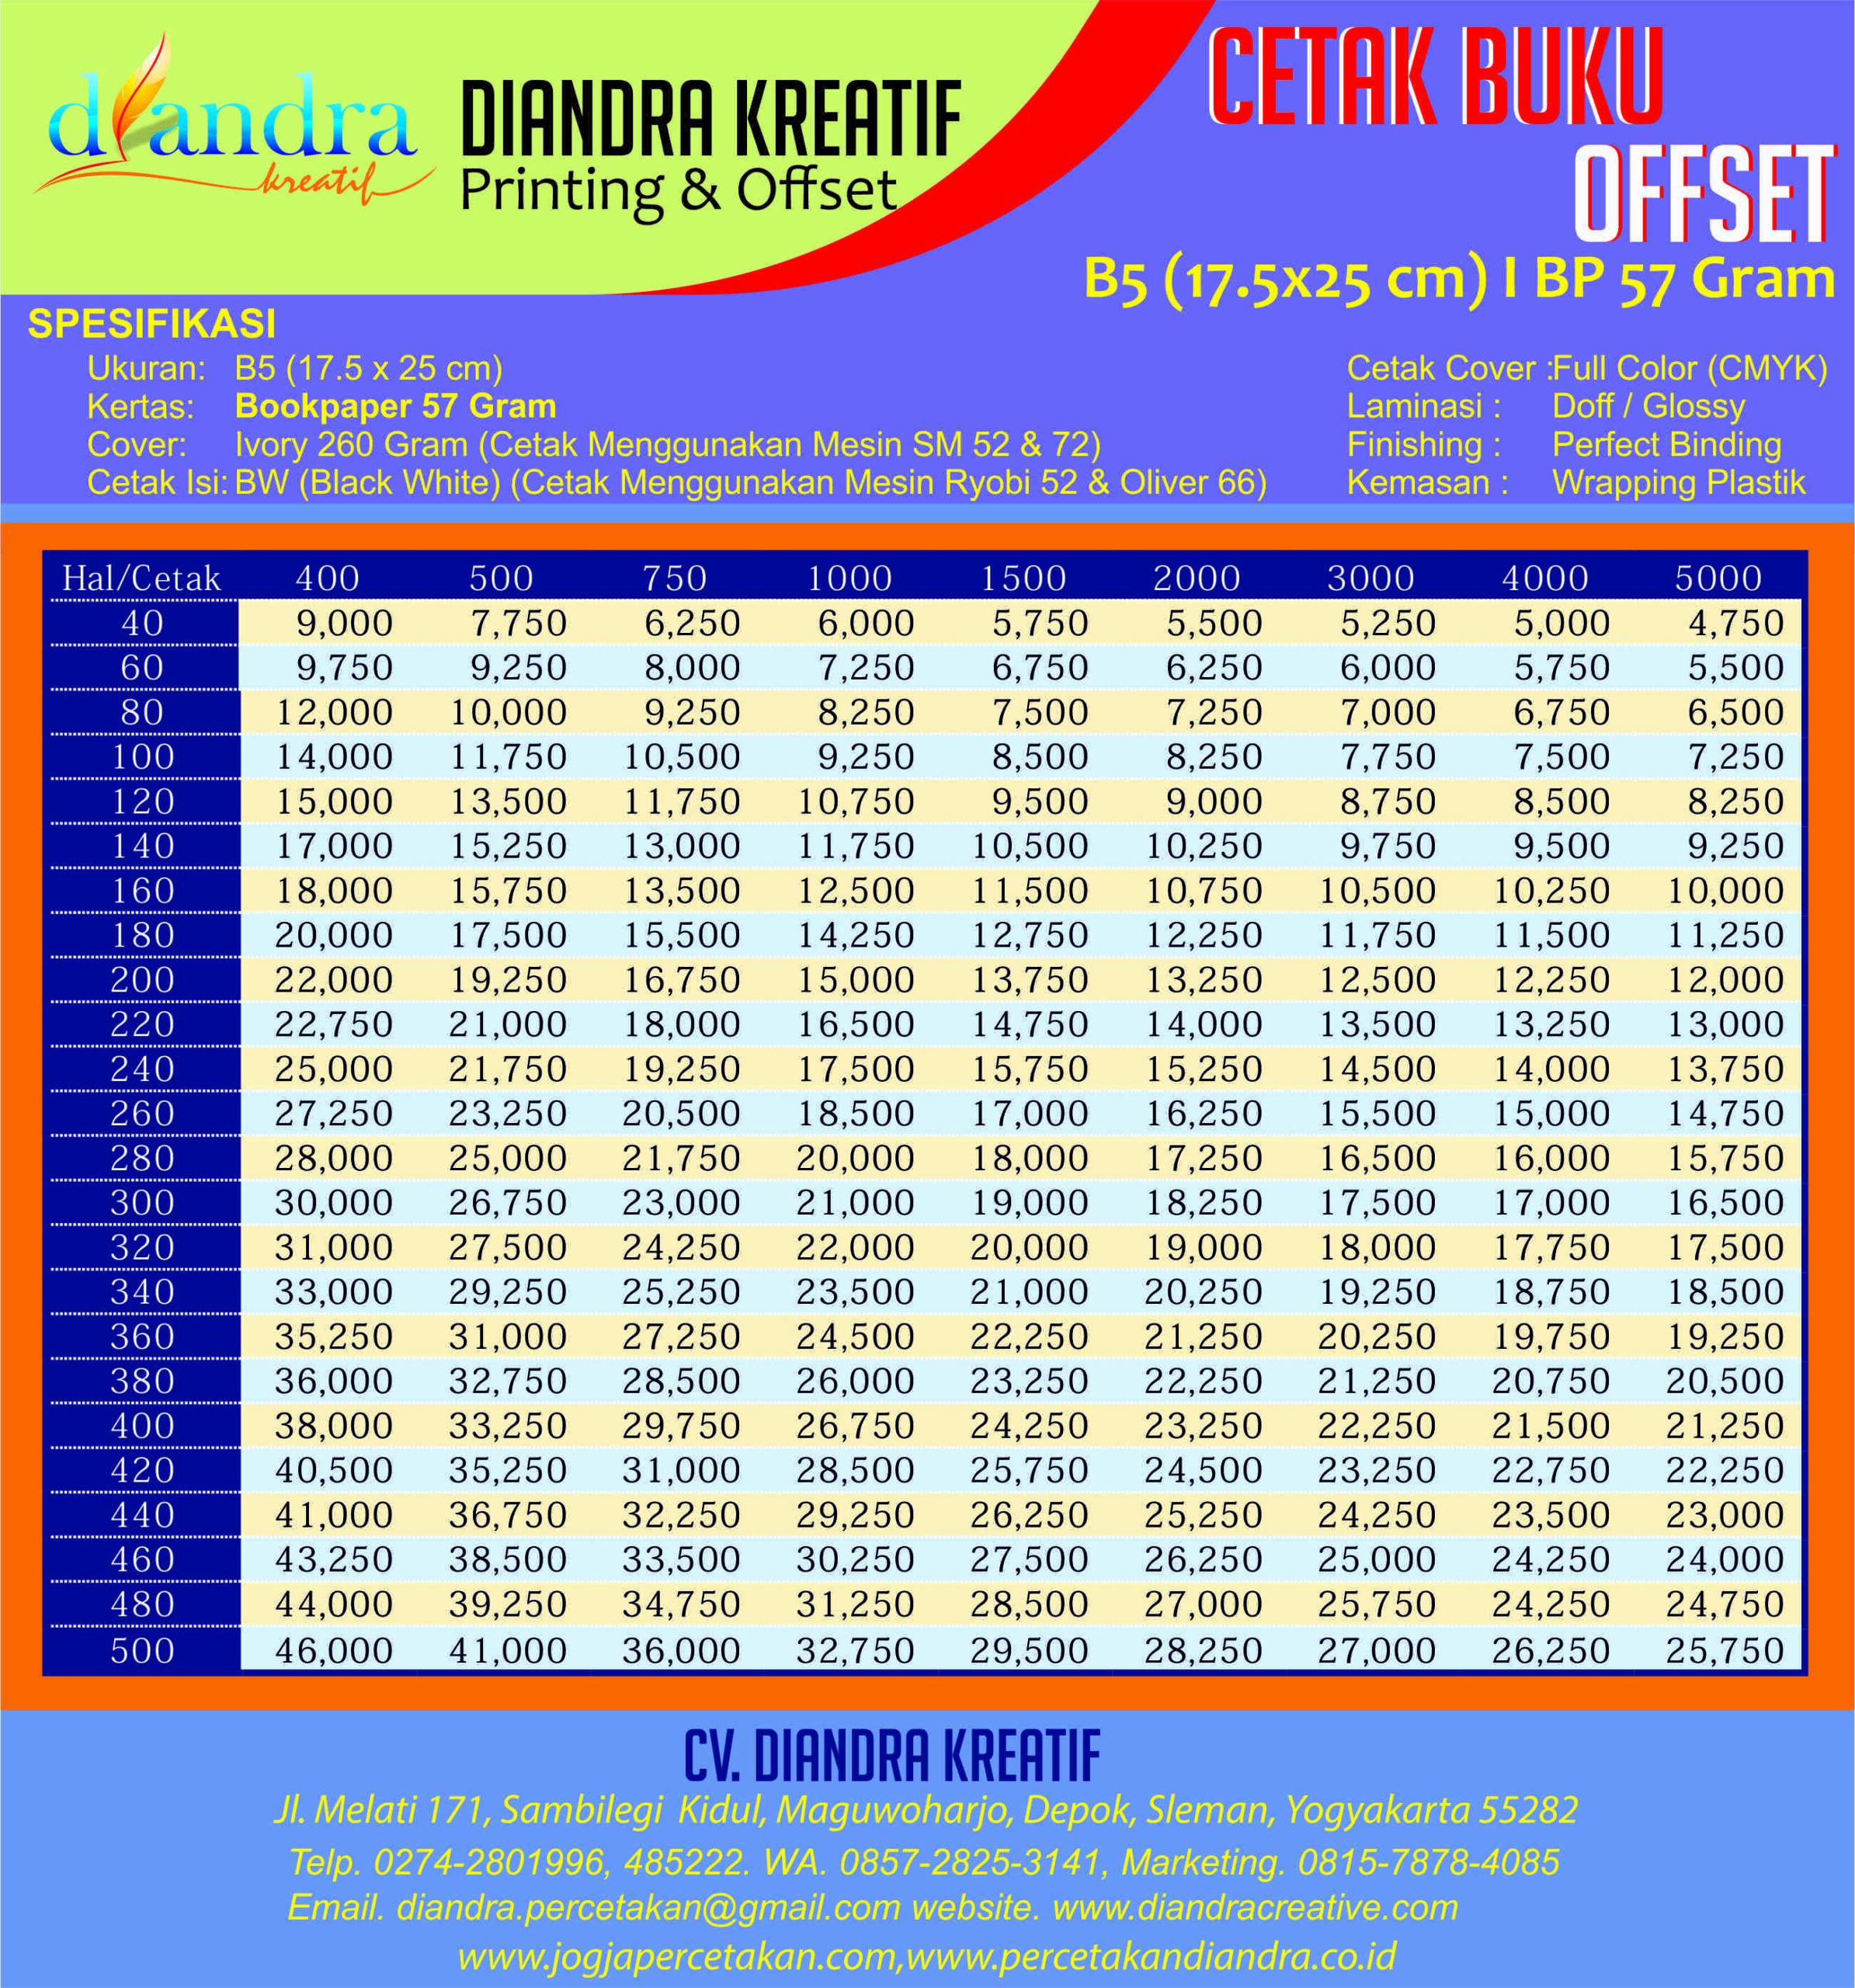 Cetak Buku Offset B5 (17x25 cm) Bookpaper 57 gram CV. Diandra Kreatif